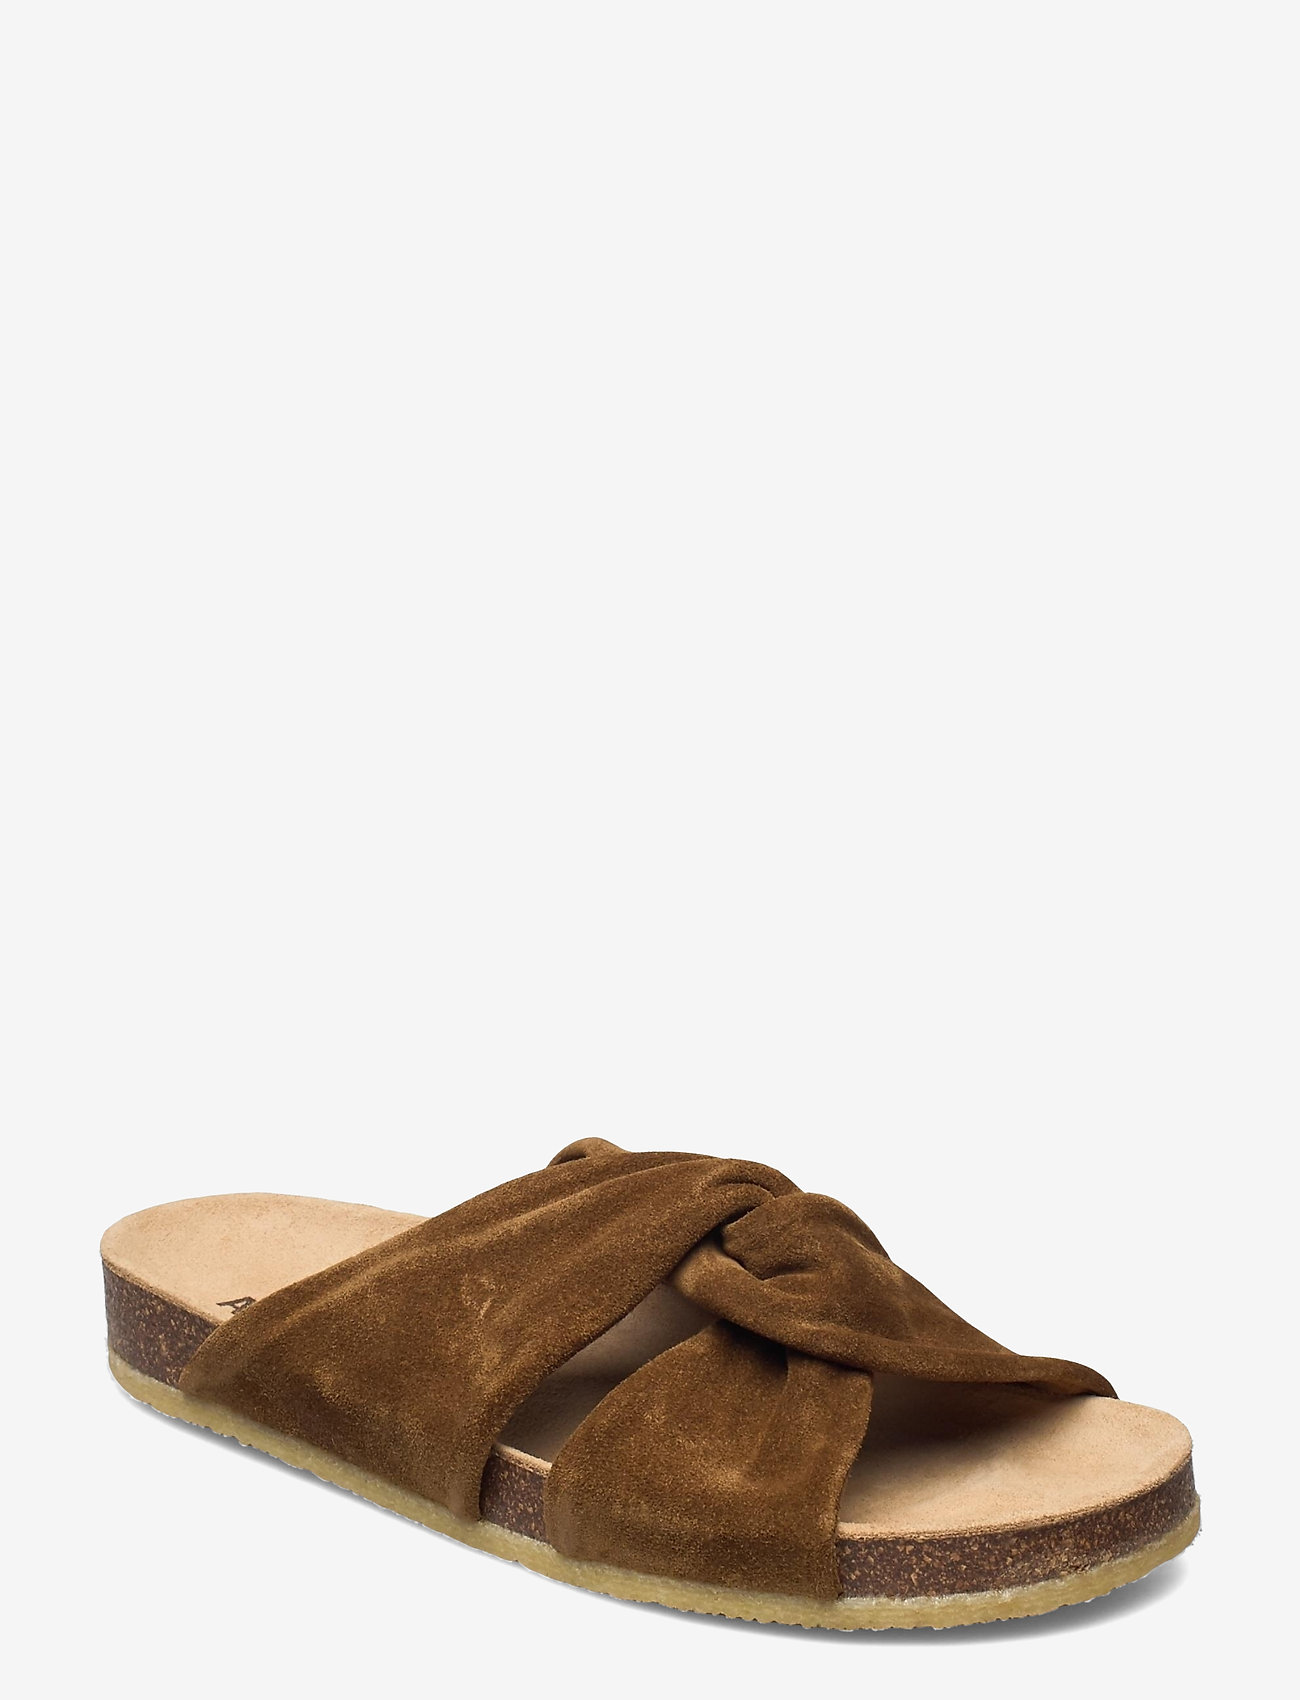 ANGULUS - Sandals - flat - open toe - op - flache sandalen - 2209 mustard - 0